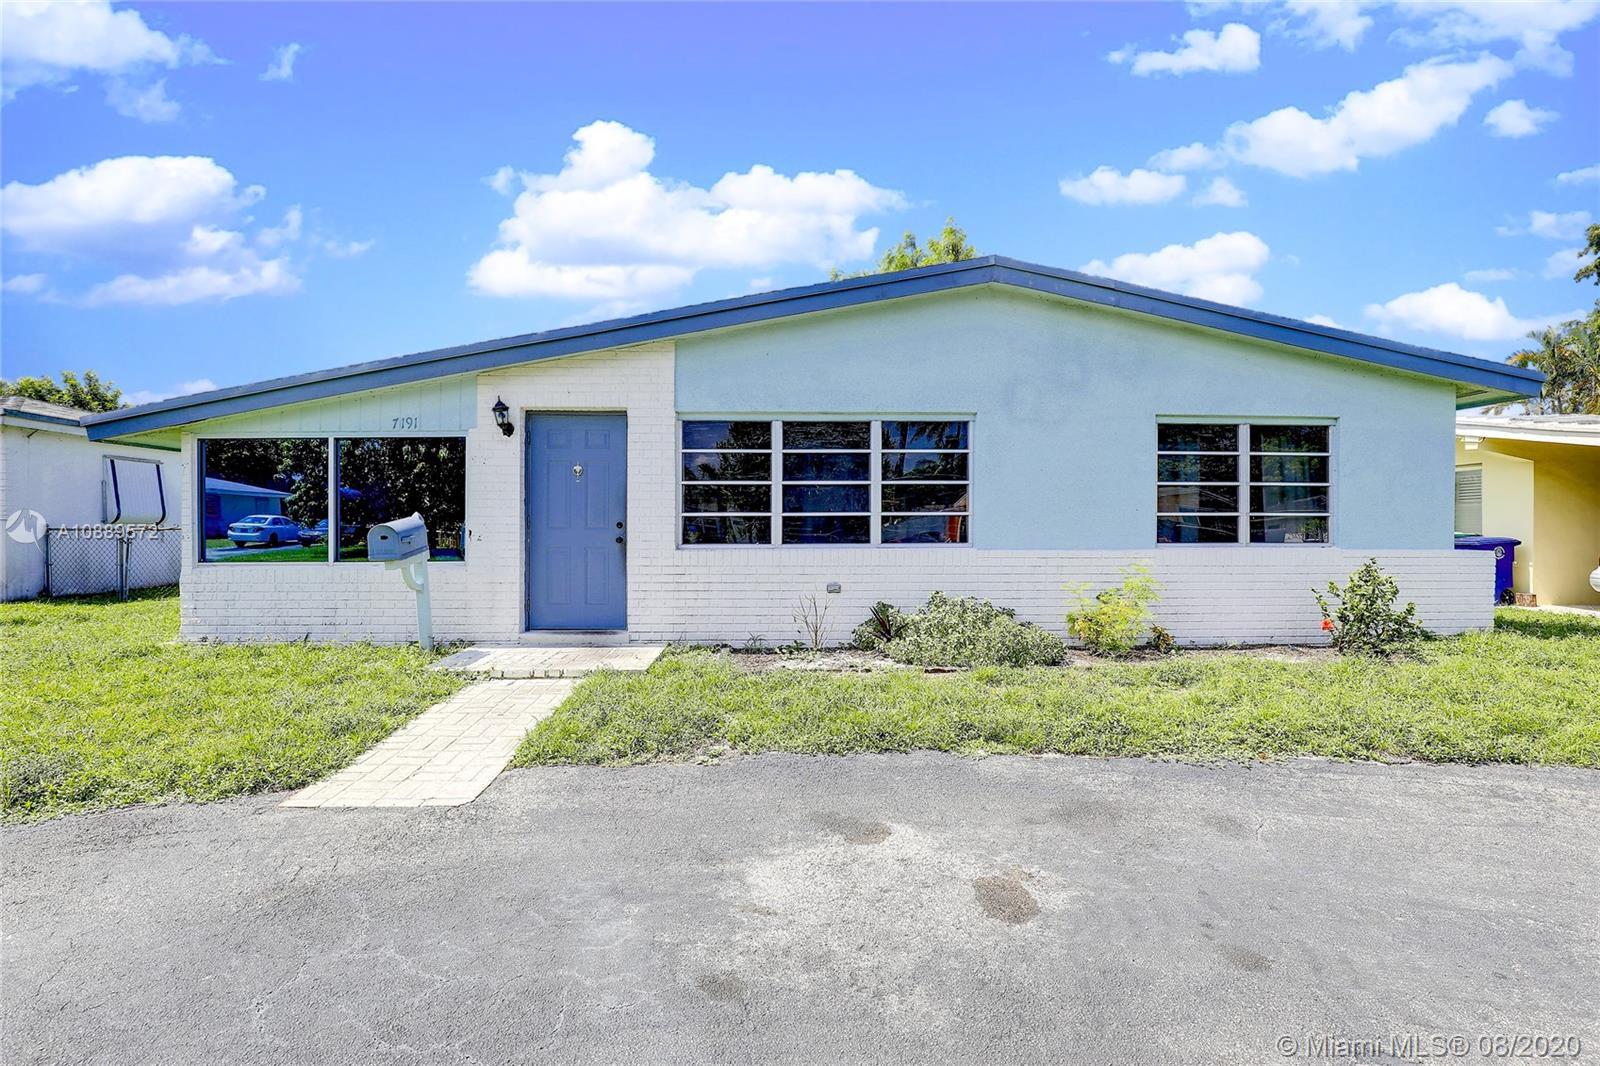 Miramar Sec - 7191 Shalimar St, Miramar, FL 33023